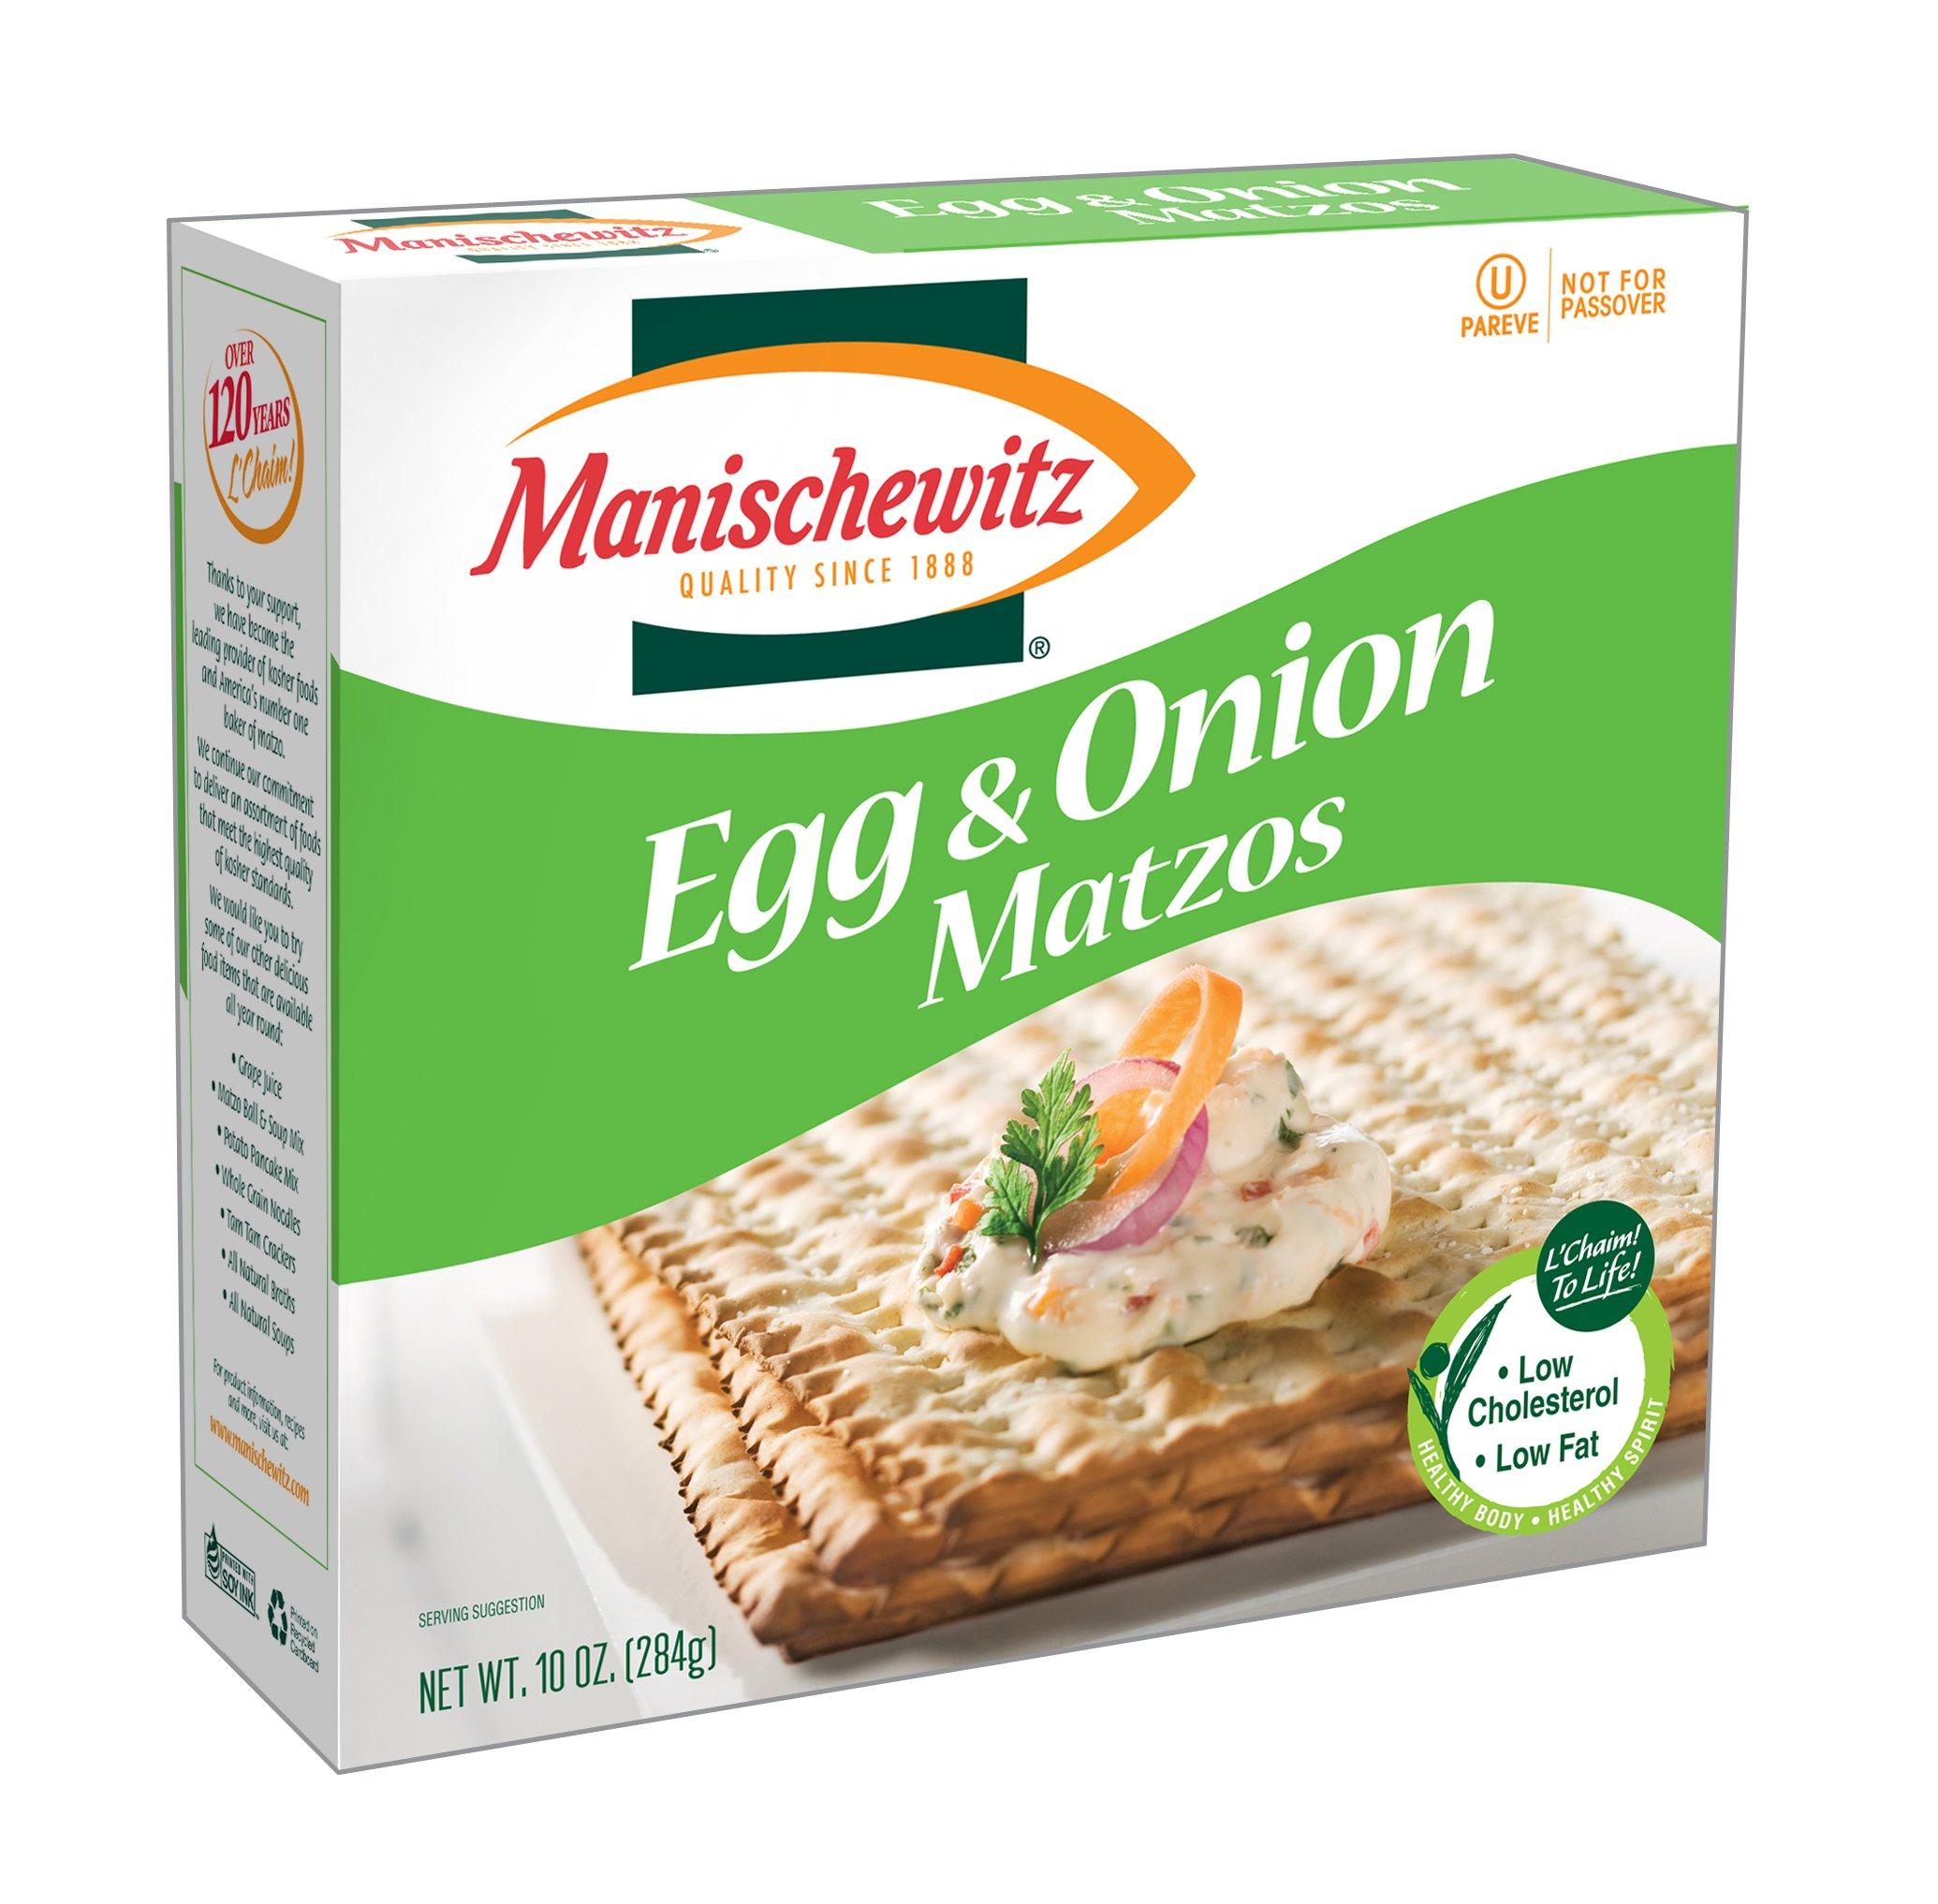 MANISCHEWITZ Egg & Onion Matzo, 10-Ounce Boxes (Pack of 8)